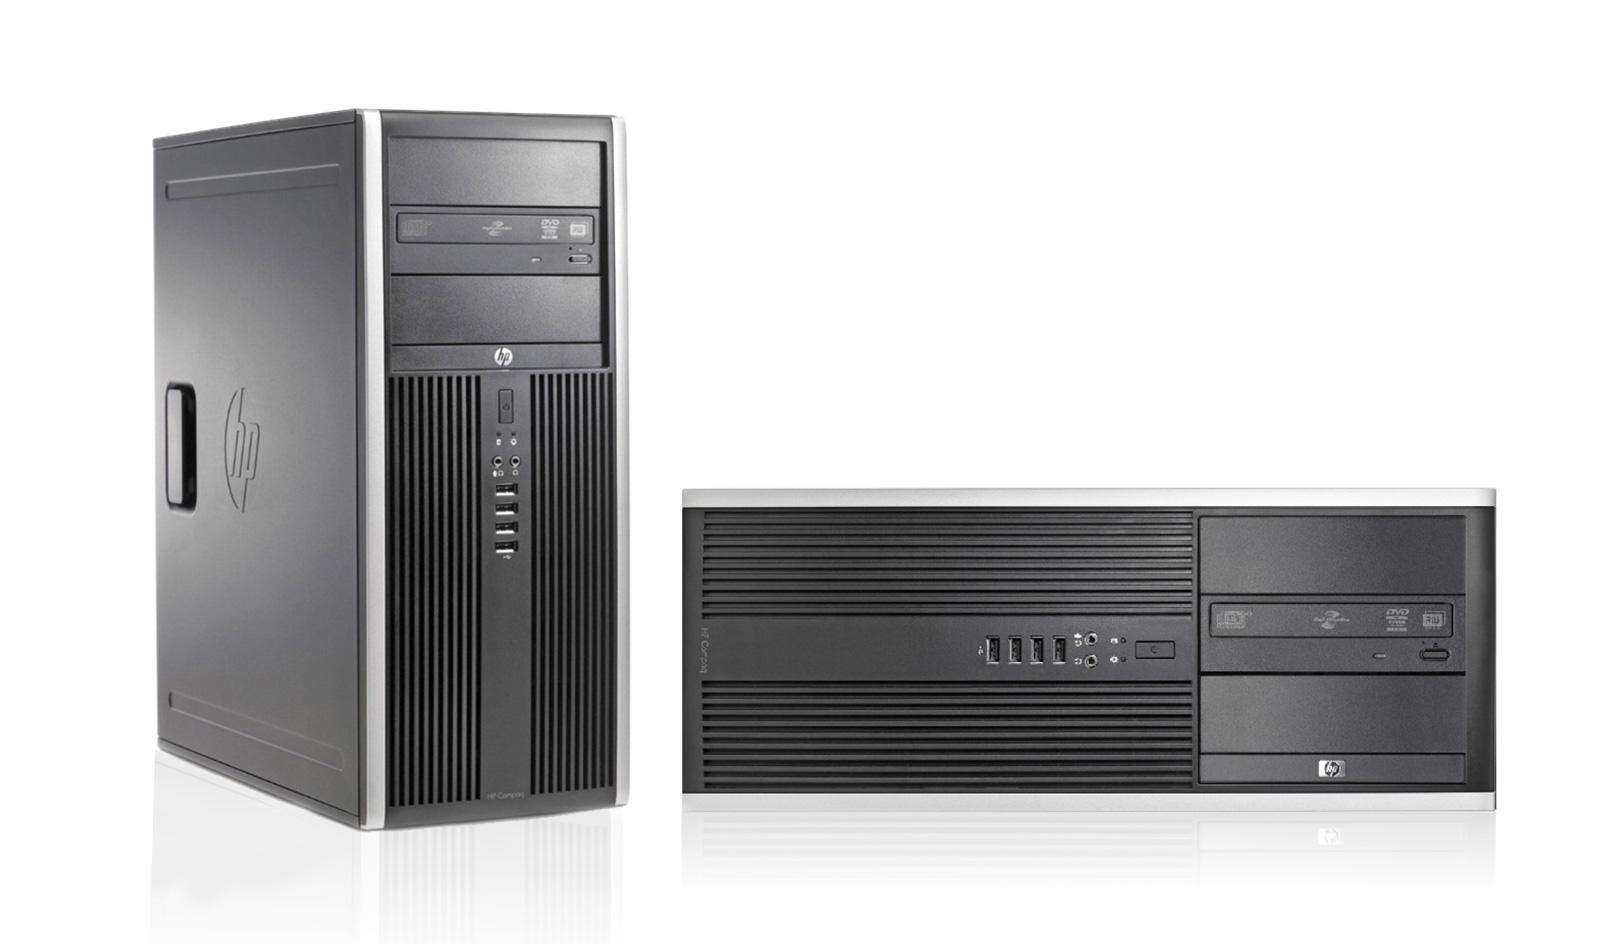 HP SQR PC 8000 Elite CMT, E8400, 4GB, 160GB HDD, DVD, Βαμμένο - HP 21817